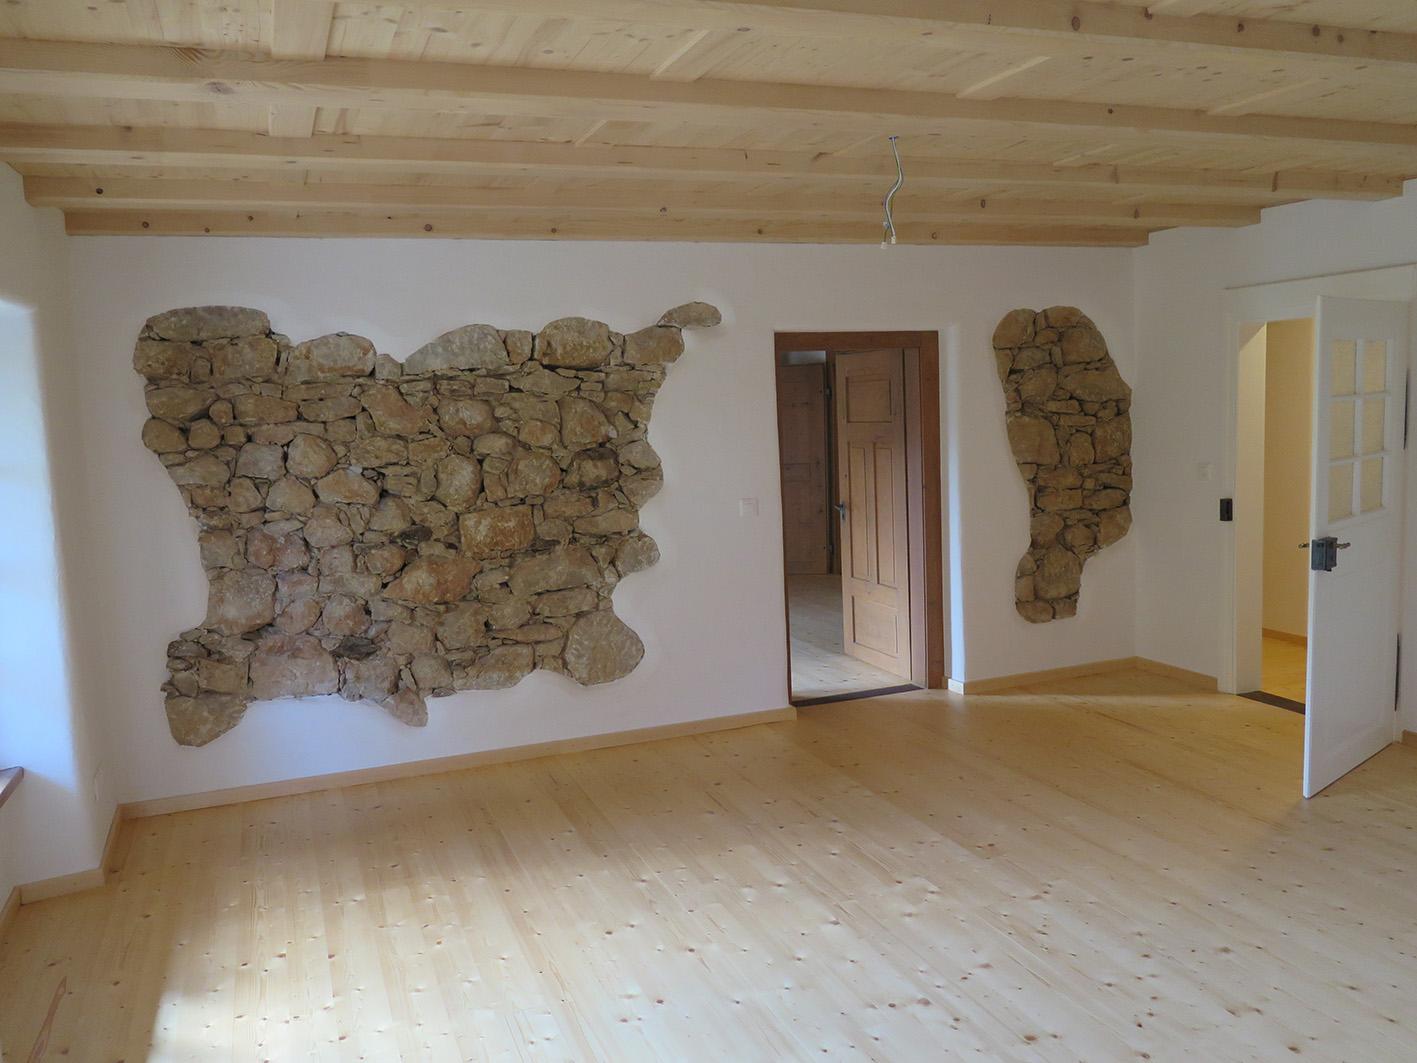 Innenausbau Umbau und Renovation «Hof Gallenkirch», Bözberg